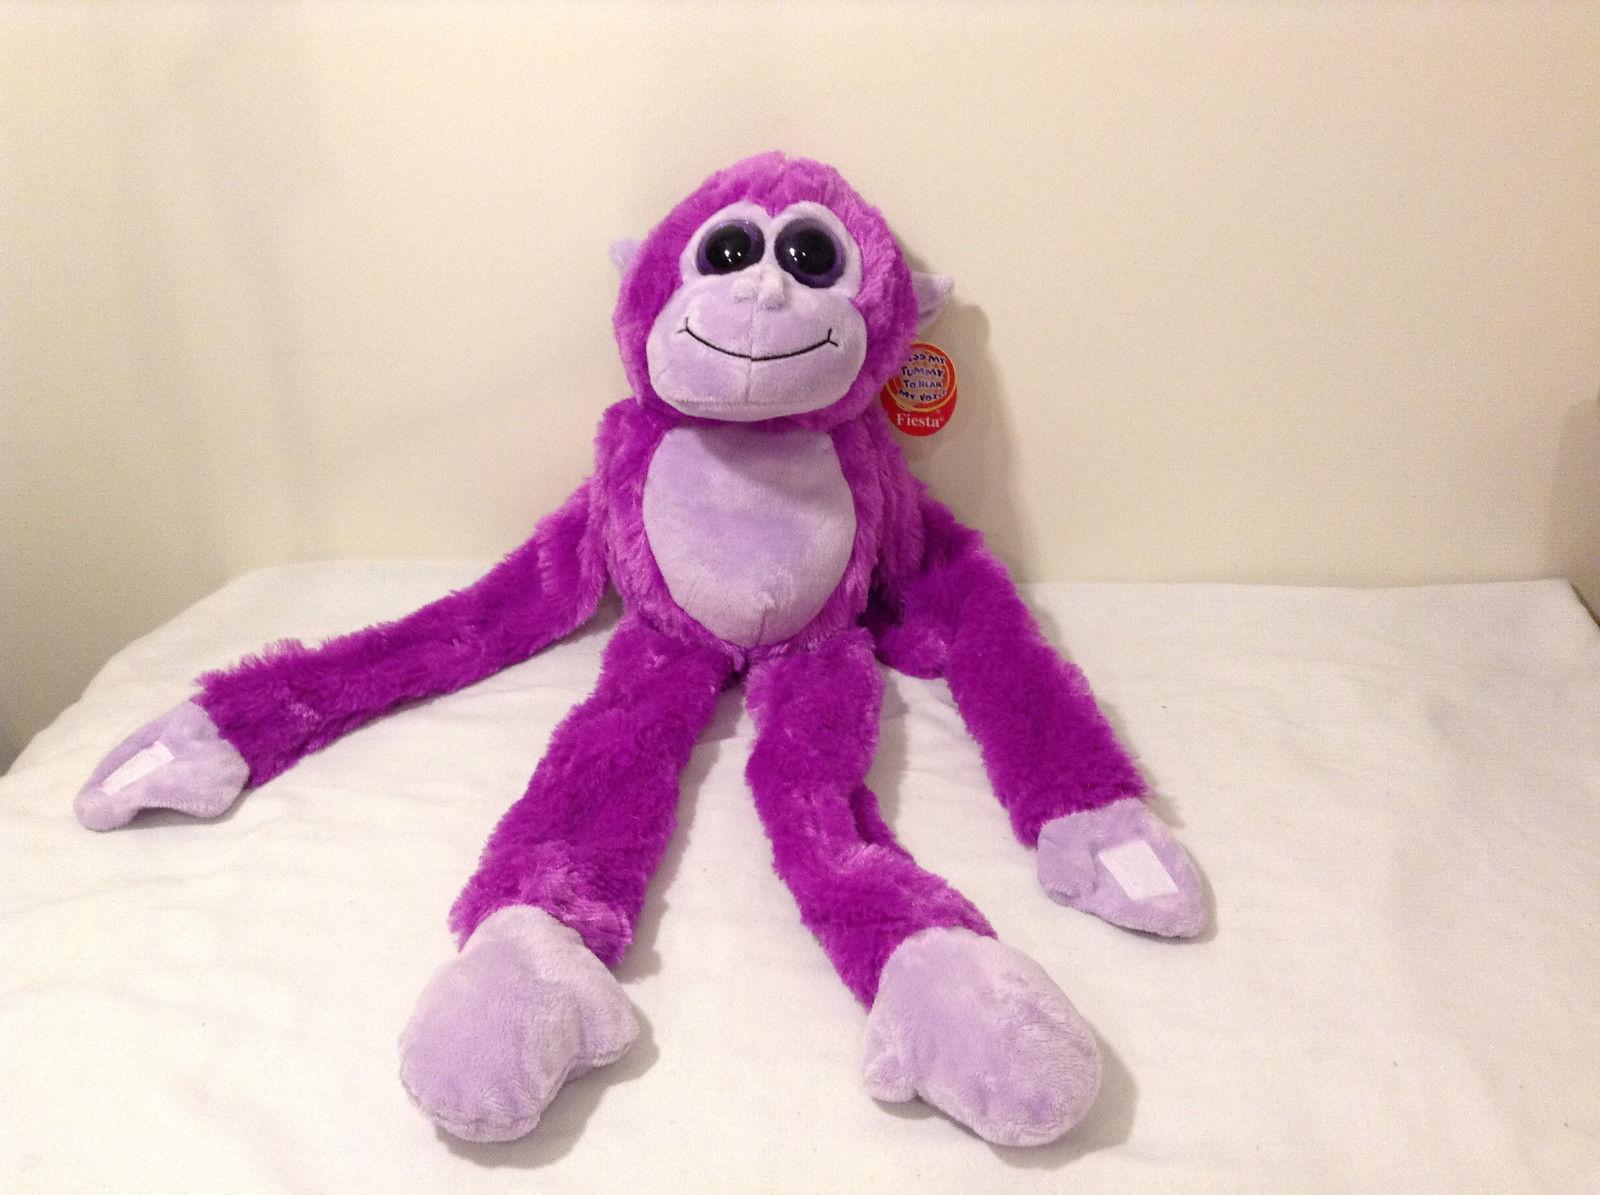 Fiesta Plush Monkey Stuffed Animal Toy Fuchsia Purple w Tummy Belly Sound Noise